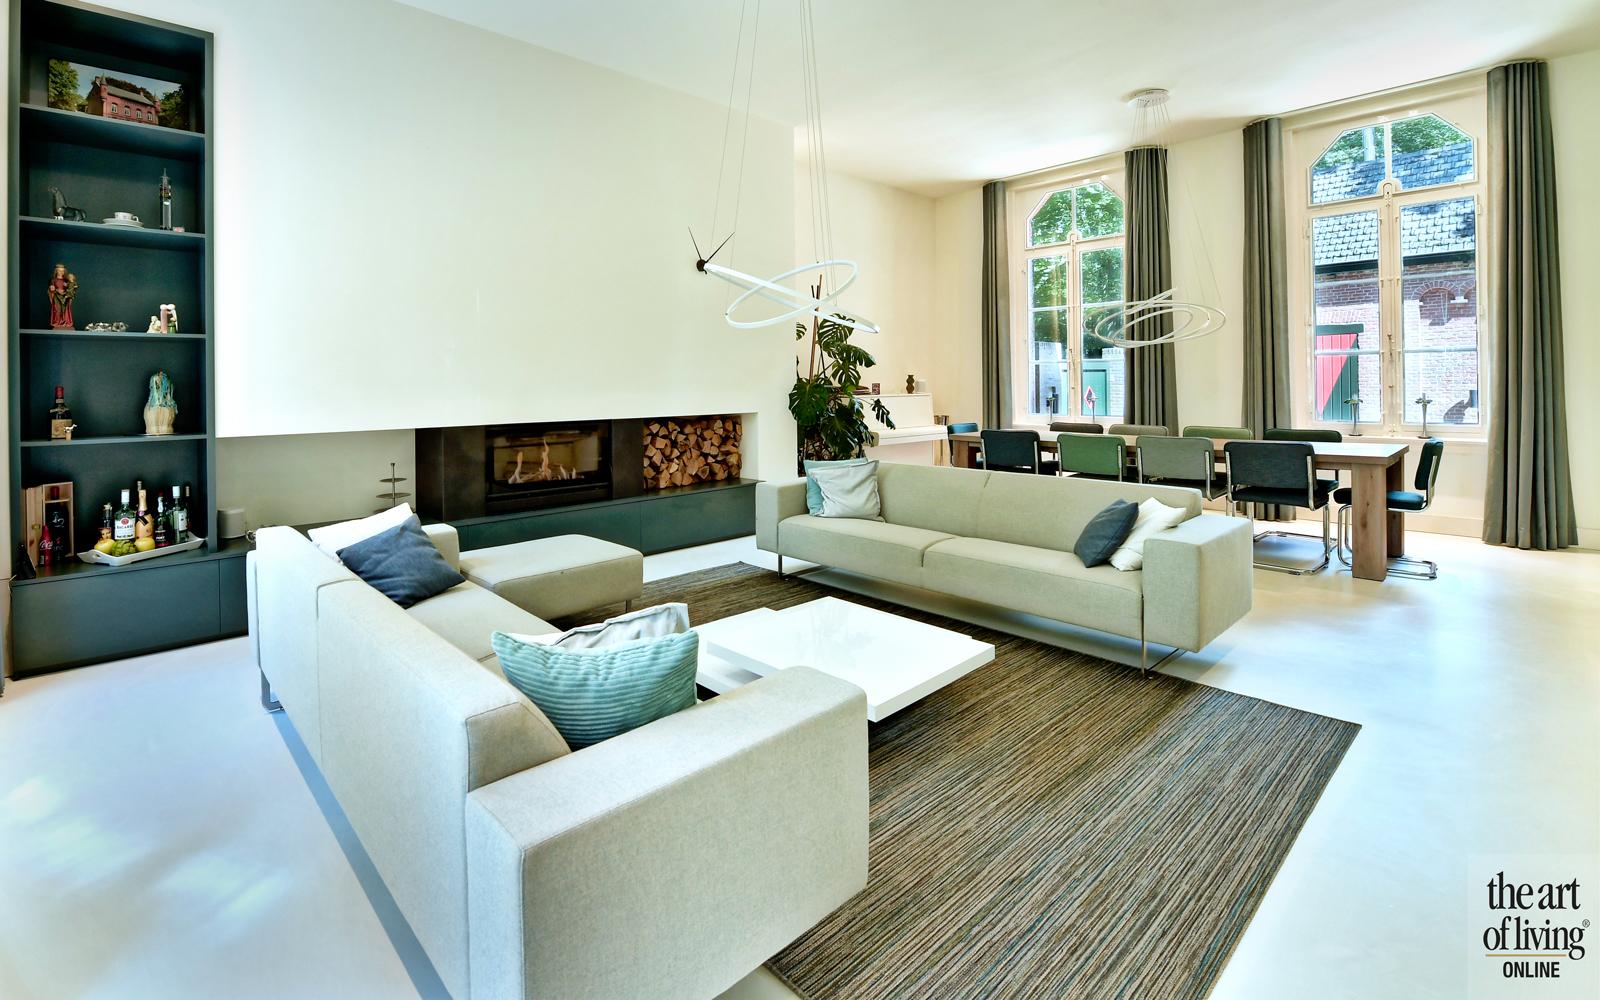 Kasteelwoning, Frans van roy, authentieke woning, Karakteristiek pand, Renovatie, Wit interieur, Houten details, Modern interieur, strak interieur